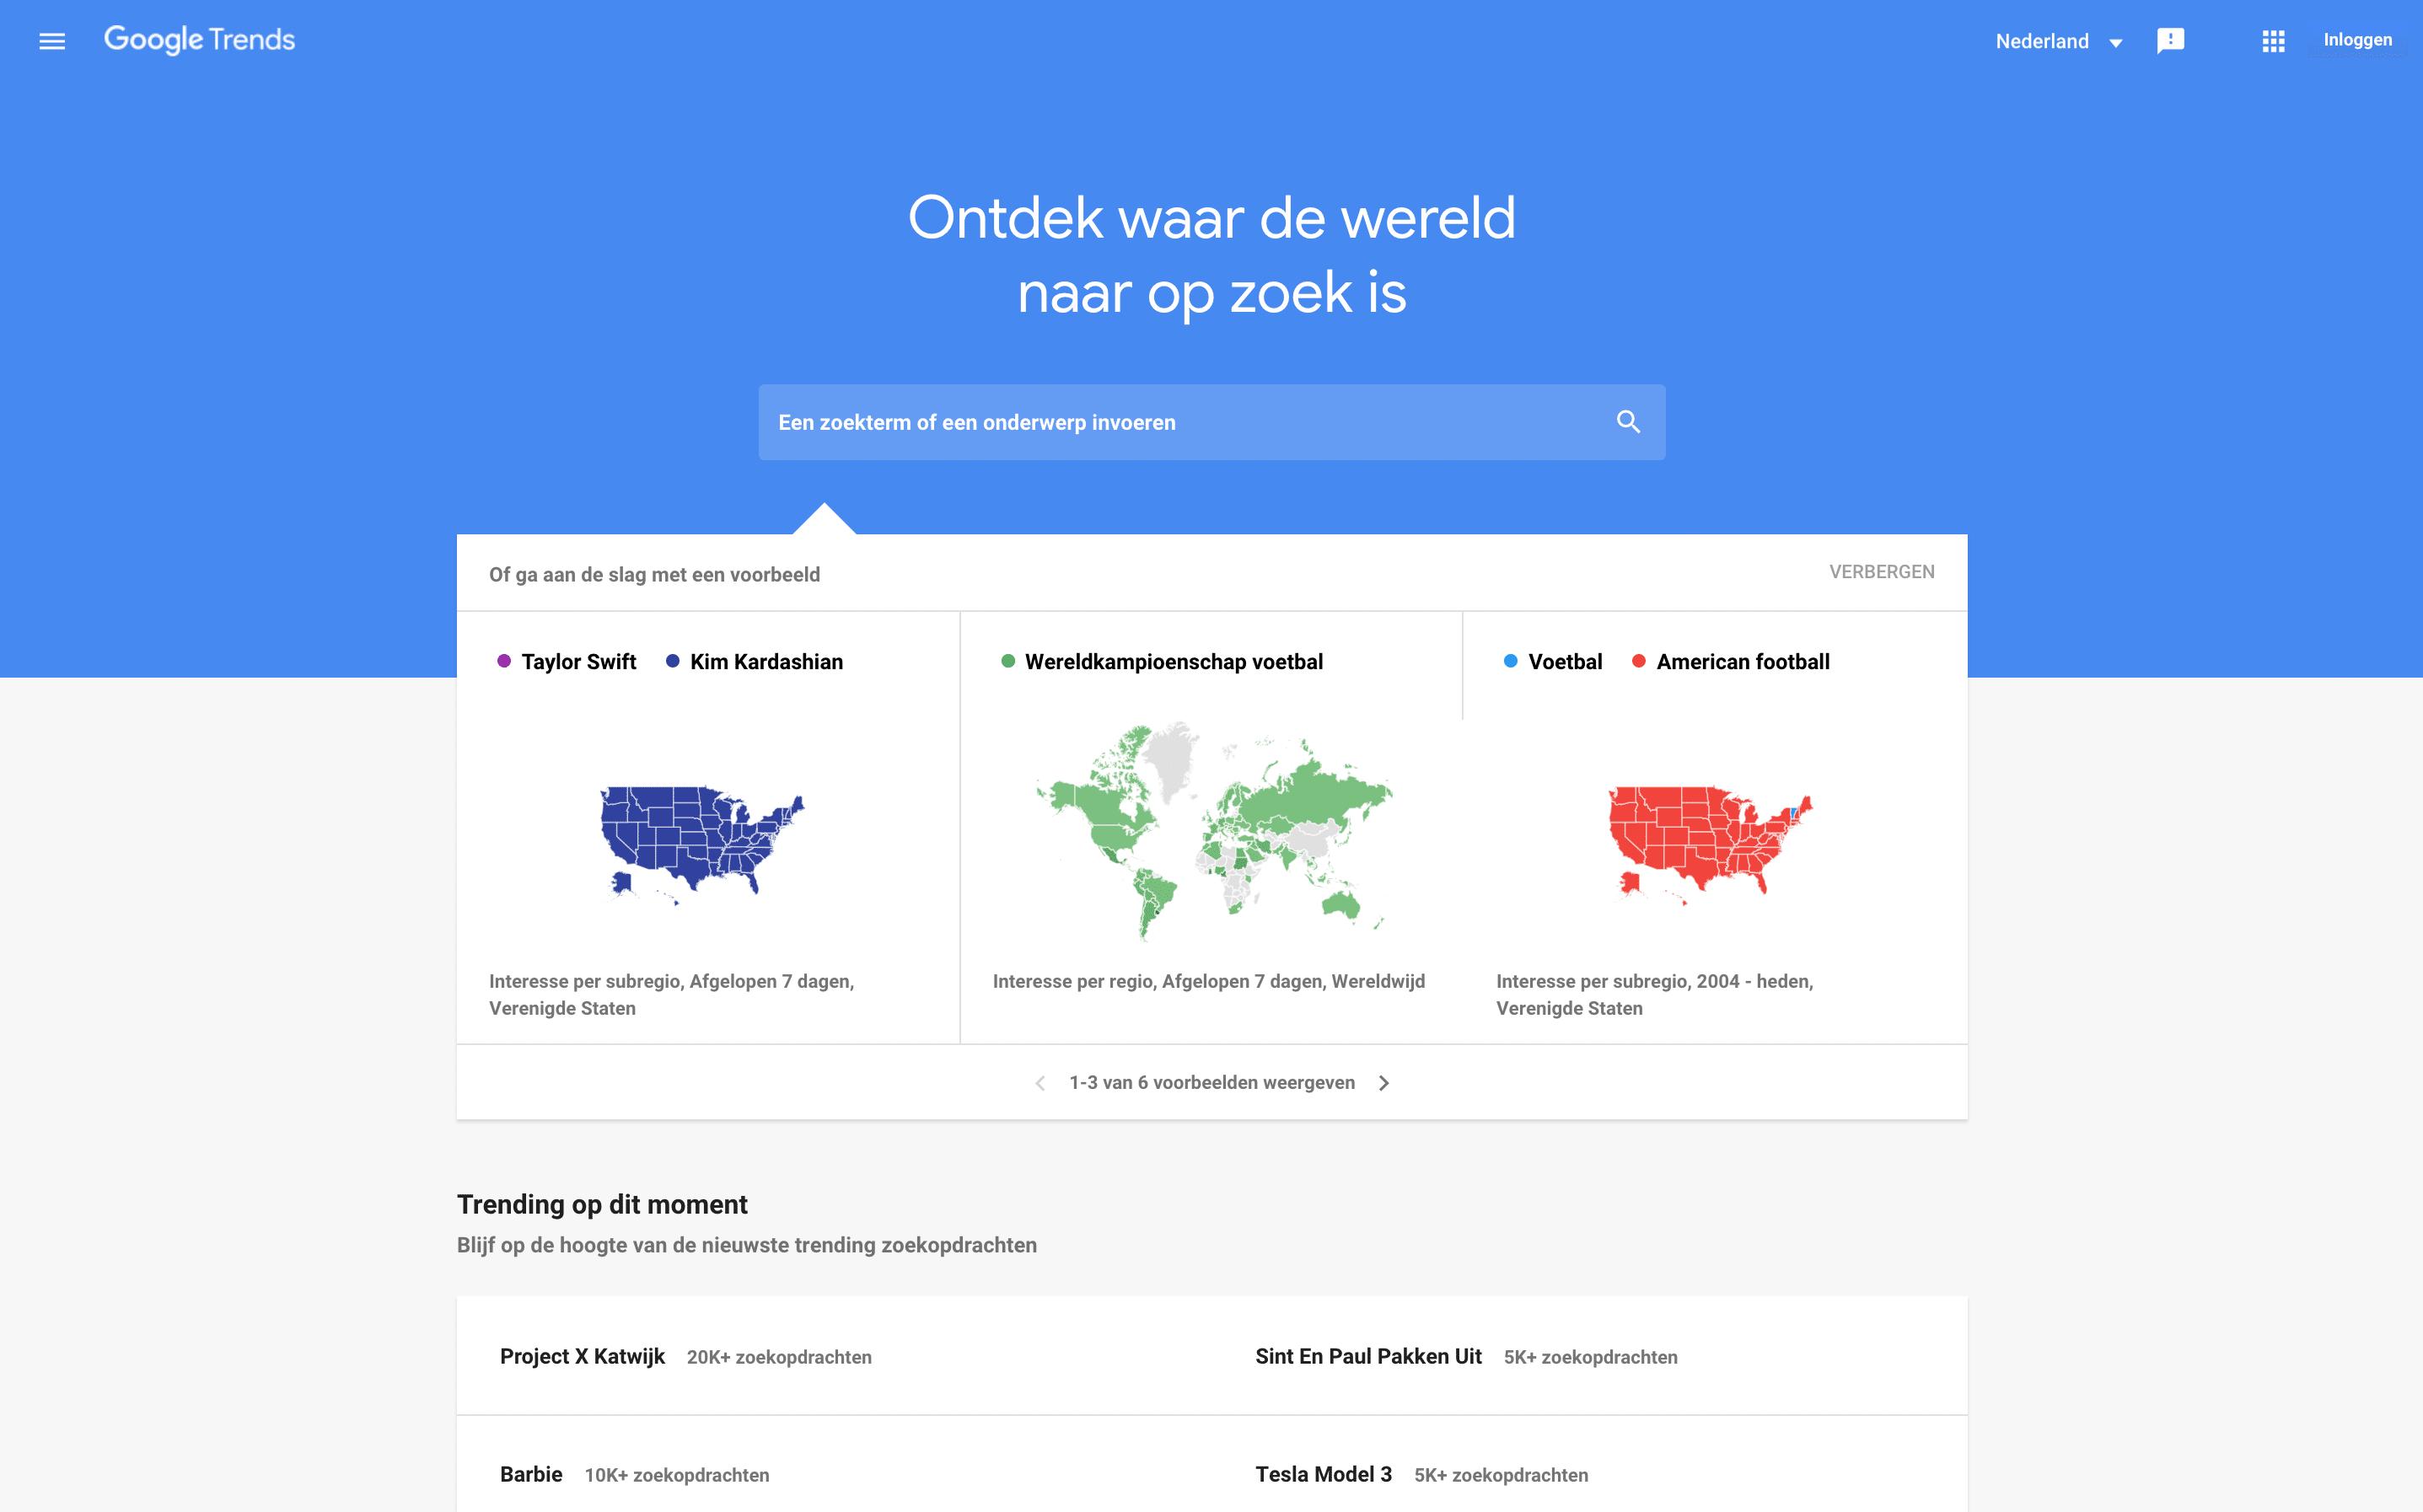 Google Trends startscherm - Lincelot